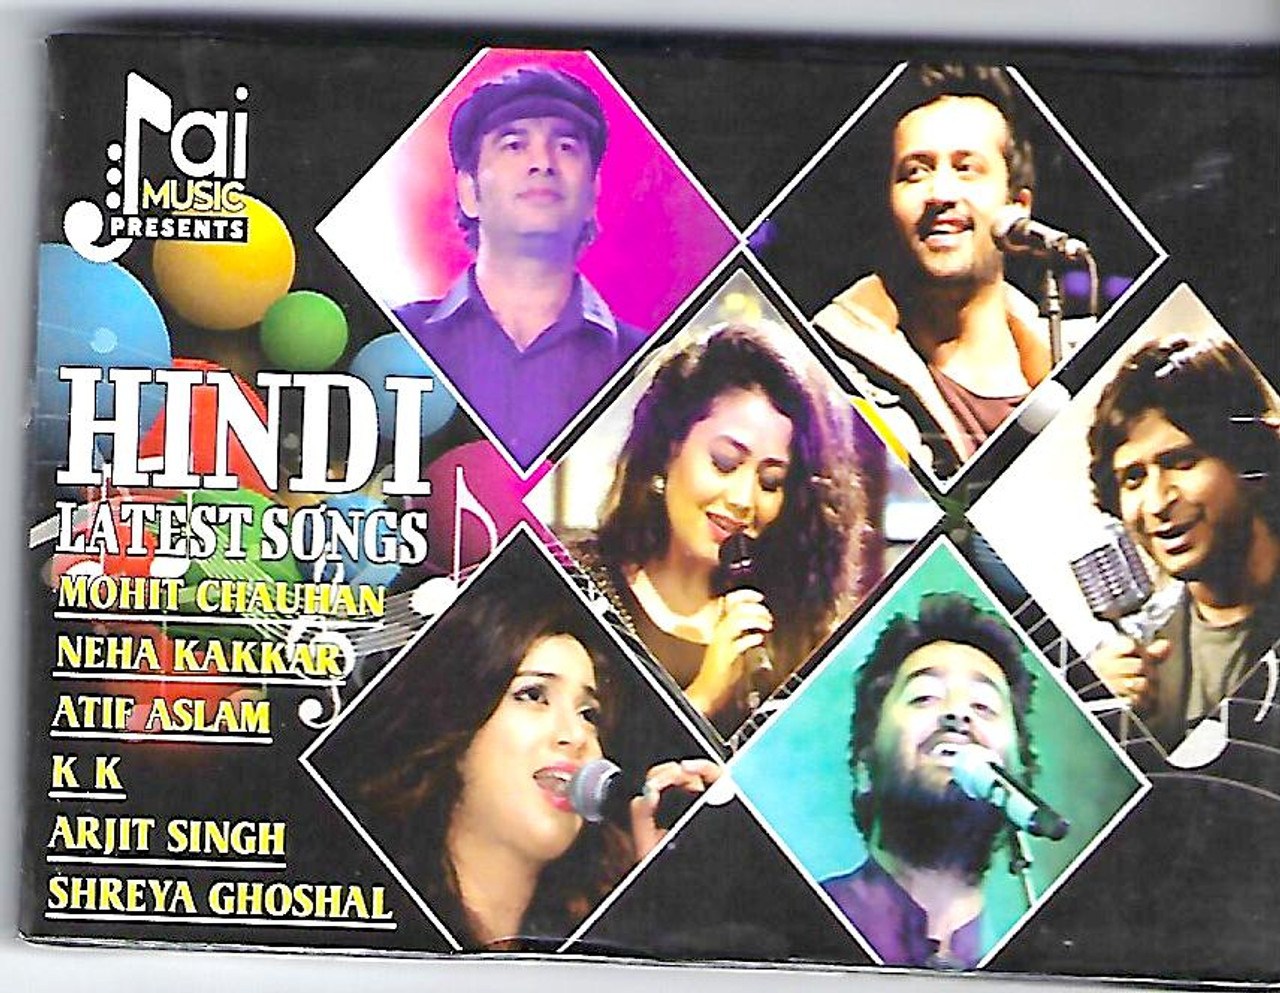 Music Card Hindi Latest Songs Arijit Singh Ankit Tiwari Sunidhi